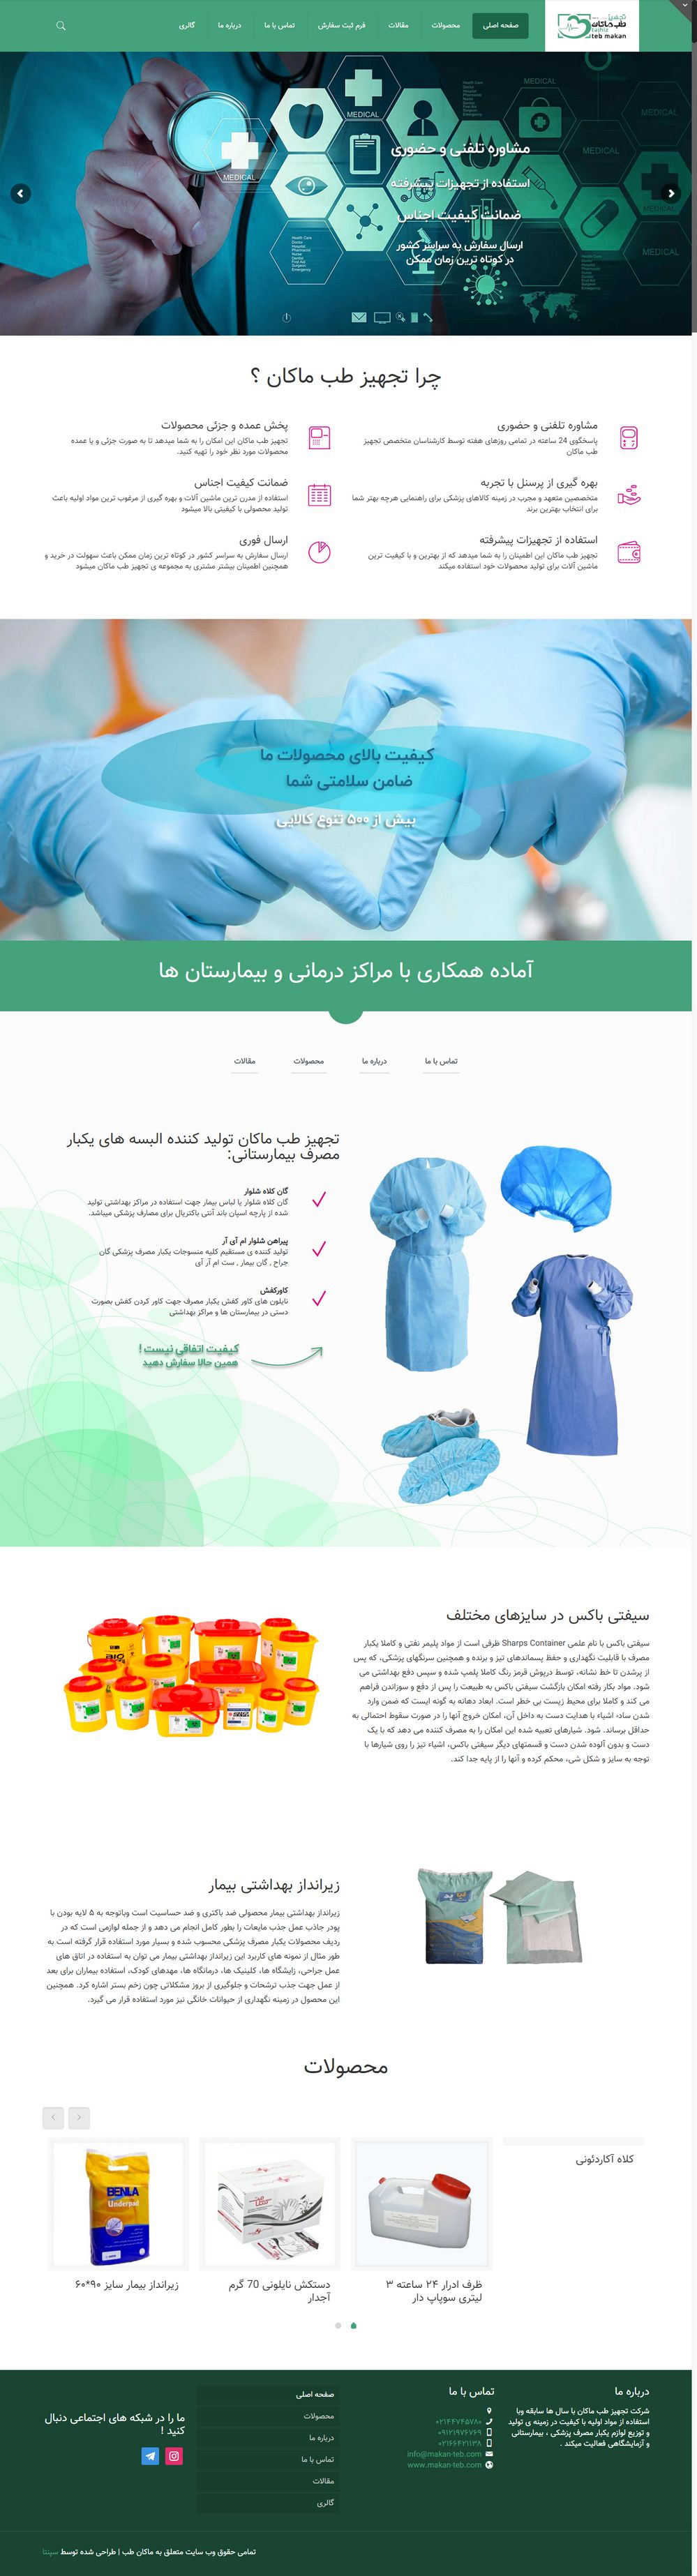 طراحی سایت پزشکی ماکان طب